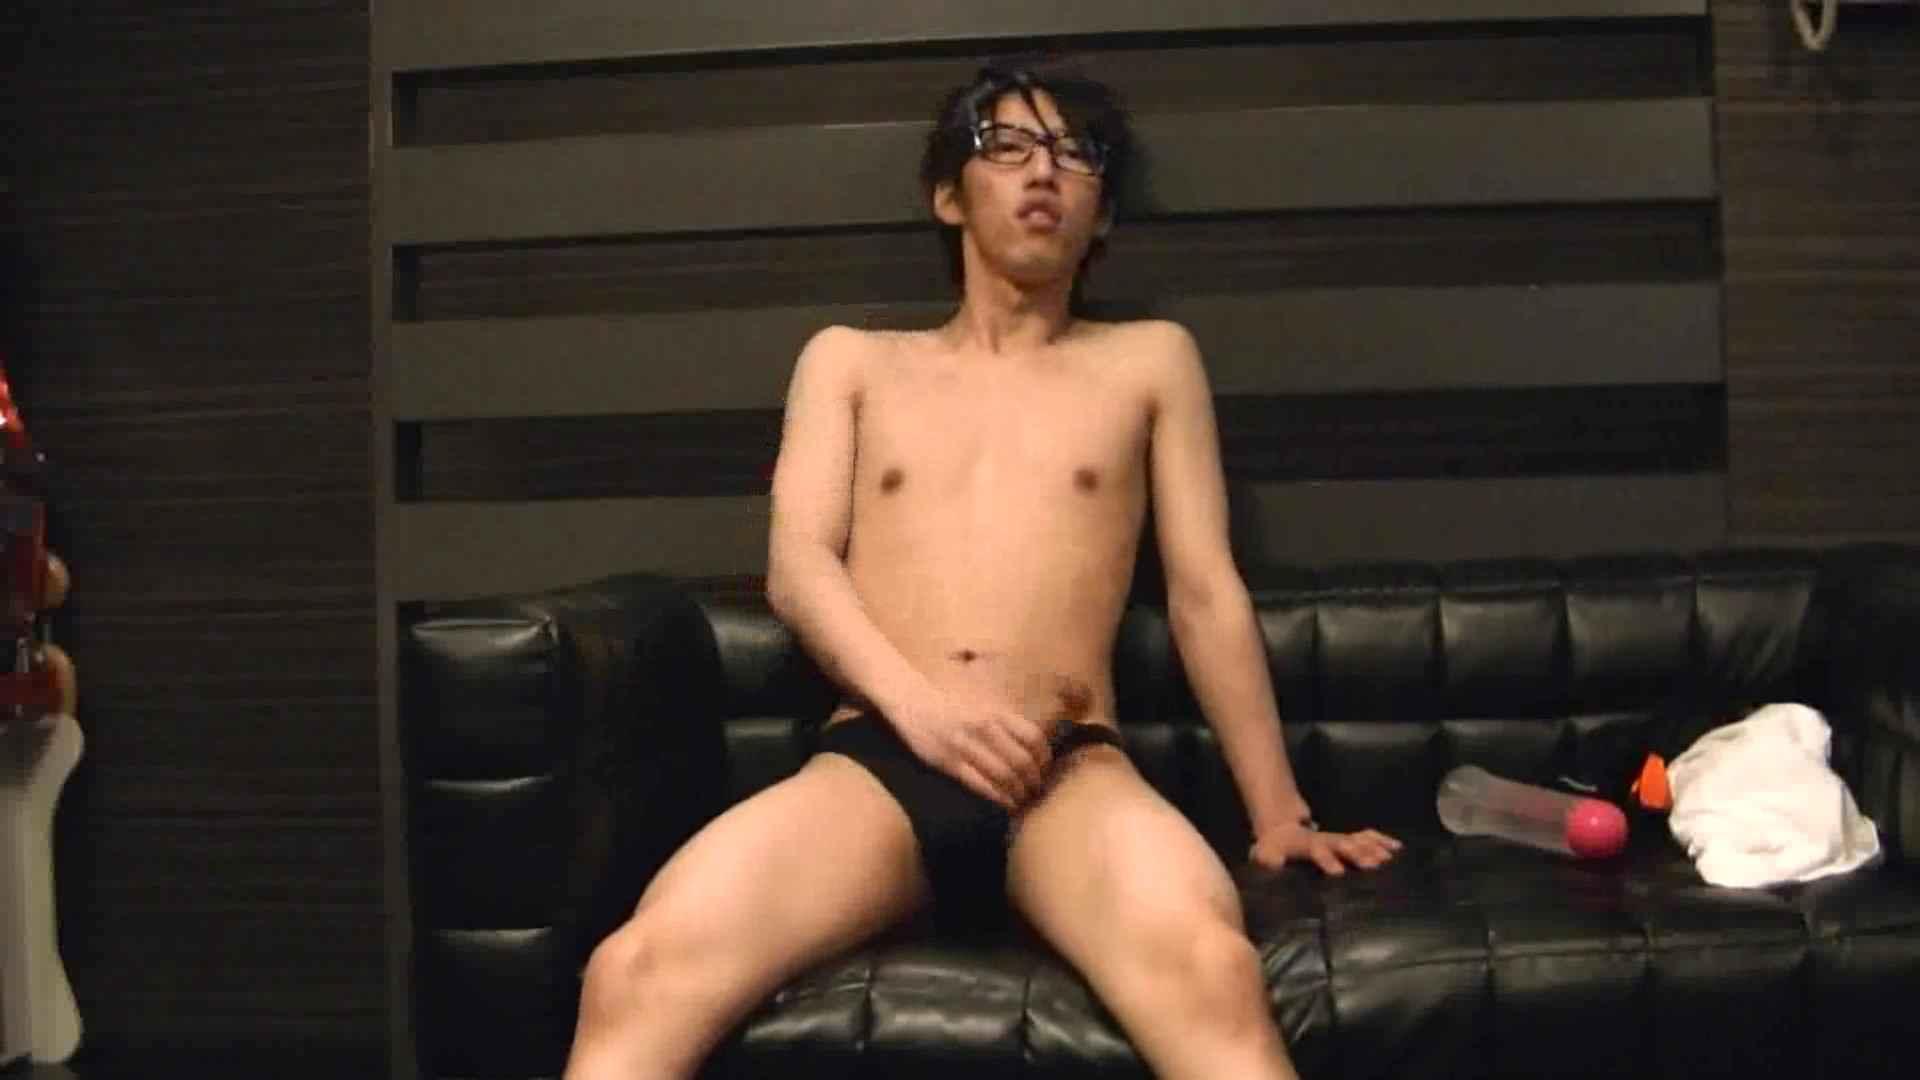 ONA見せカーニバル!! Vol3 男  93pic 45